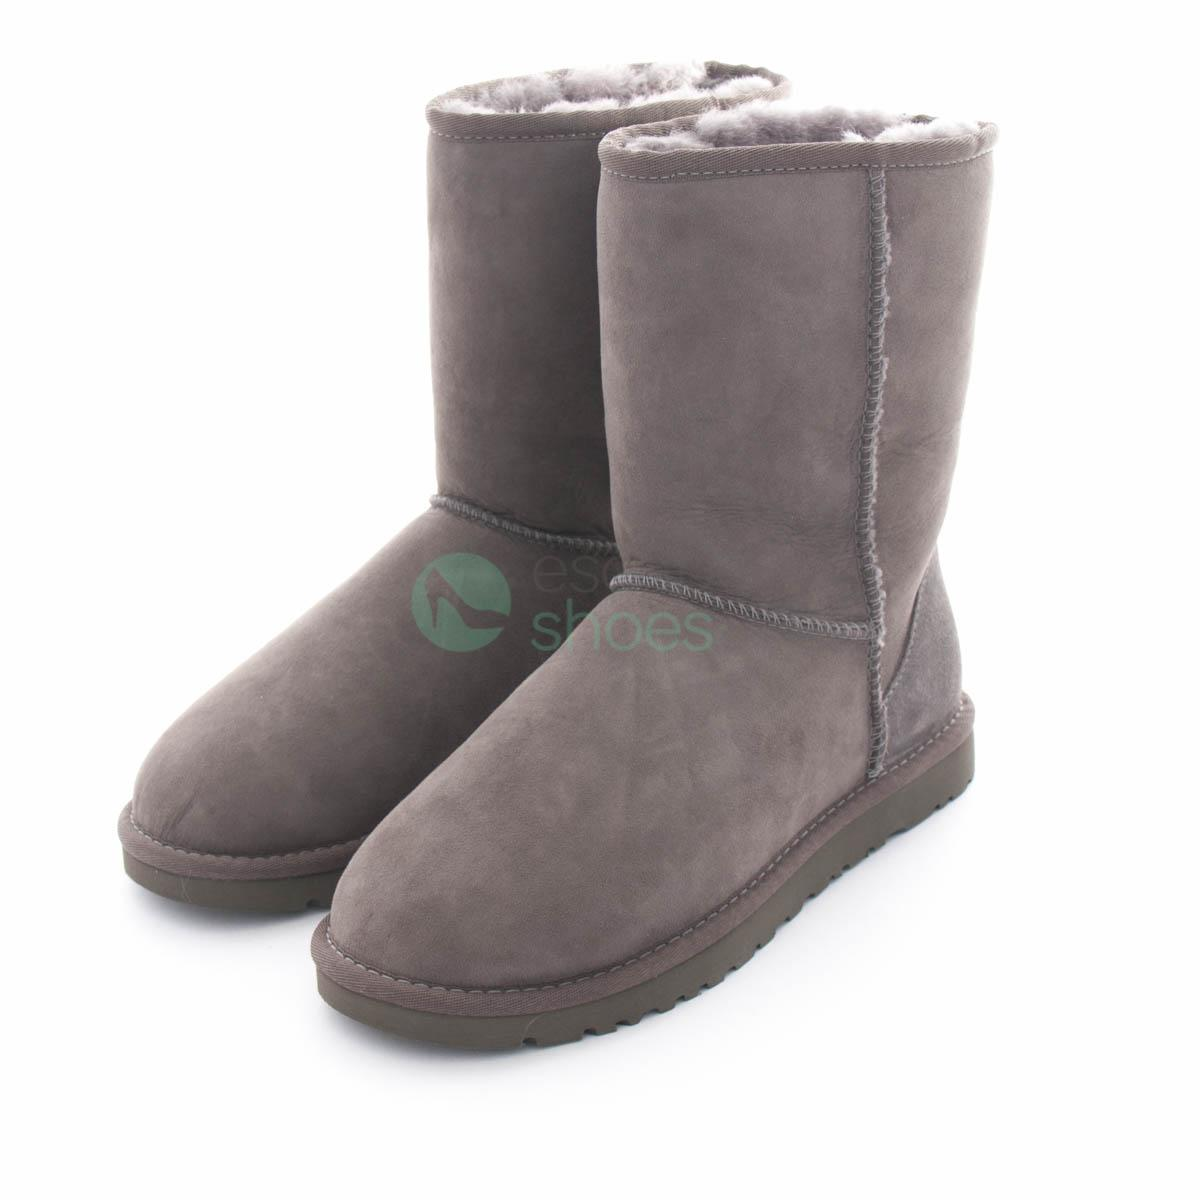 6bb127156f9 Boots UGG Classic Short Grey 5825